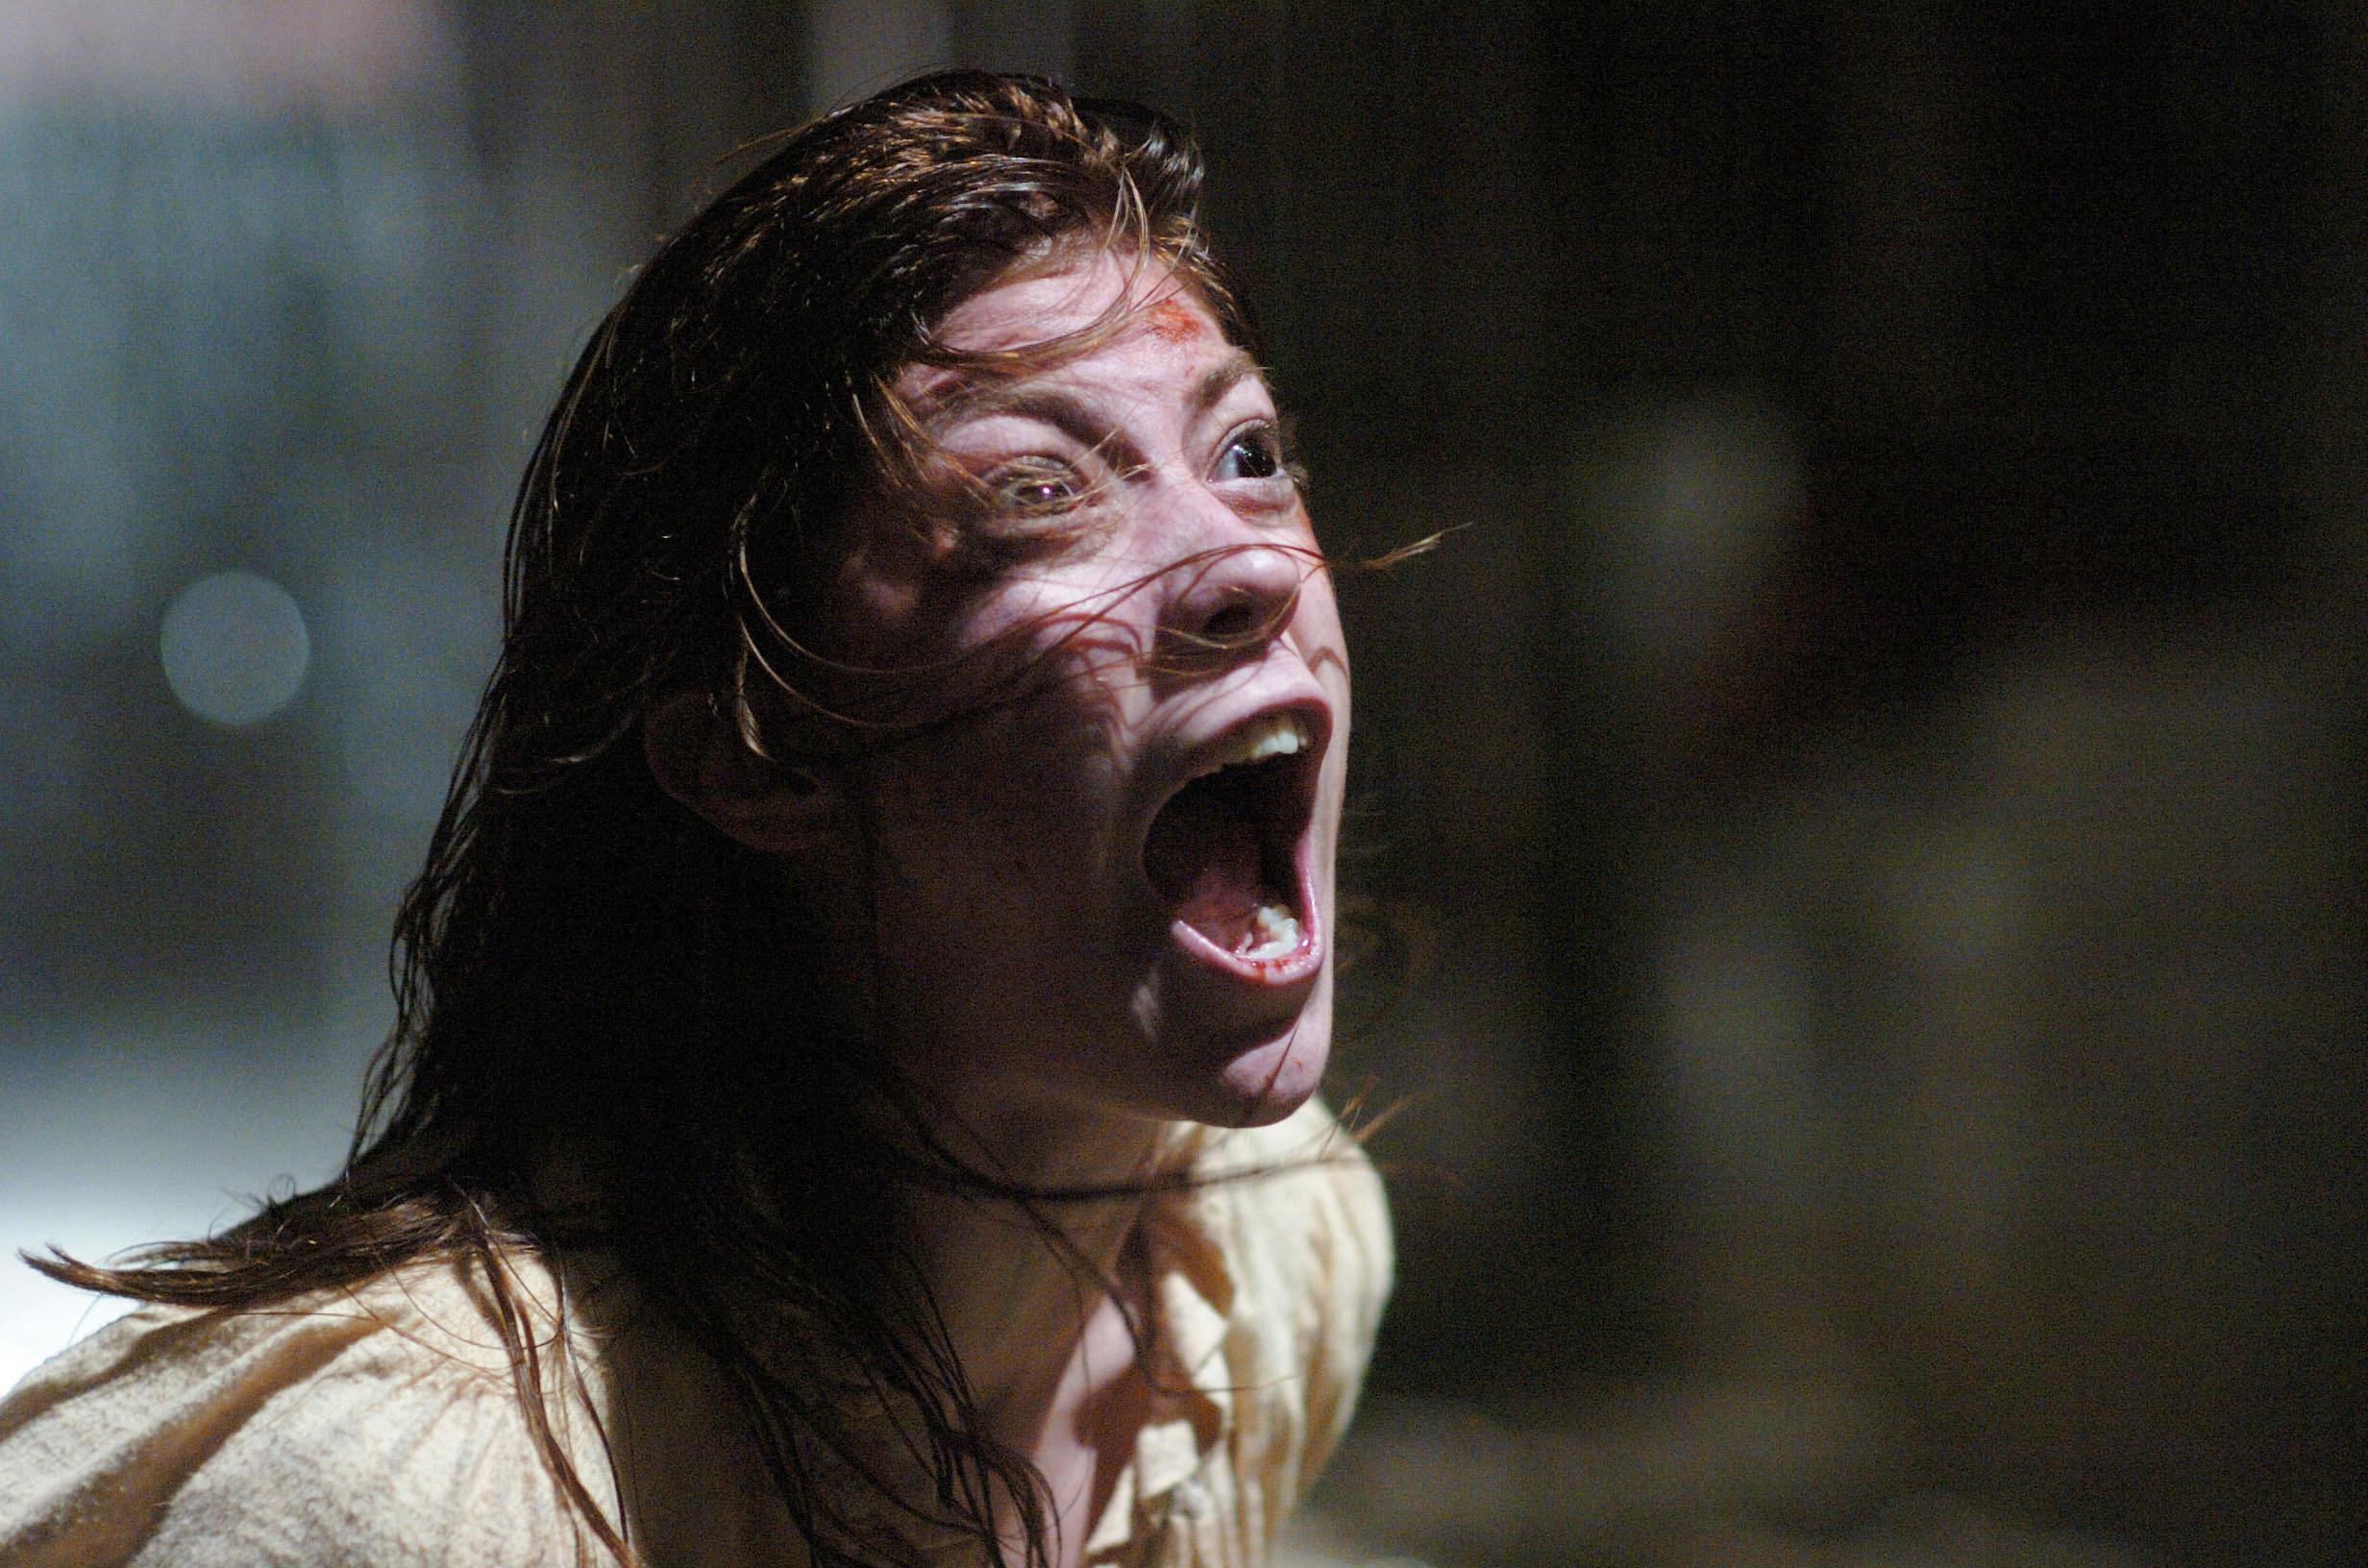 Emily Rose screaming in torture